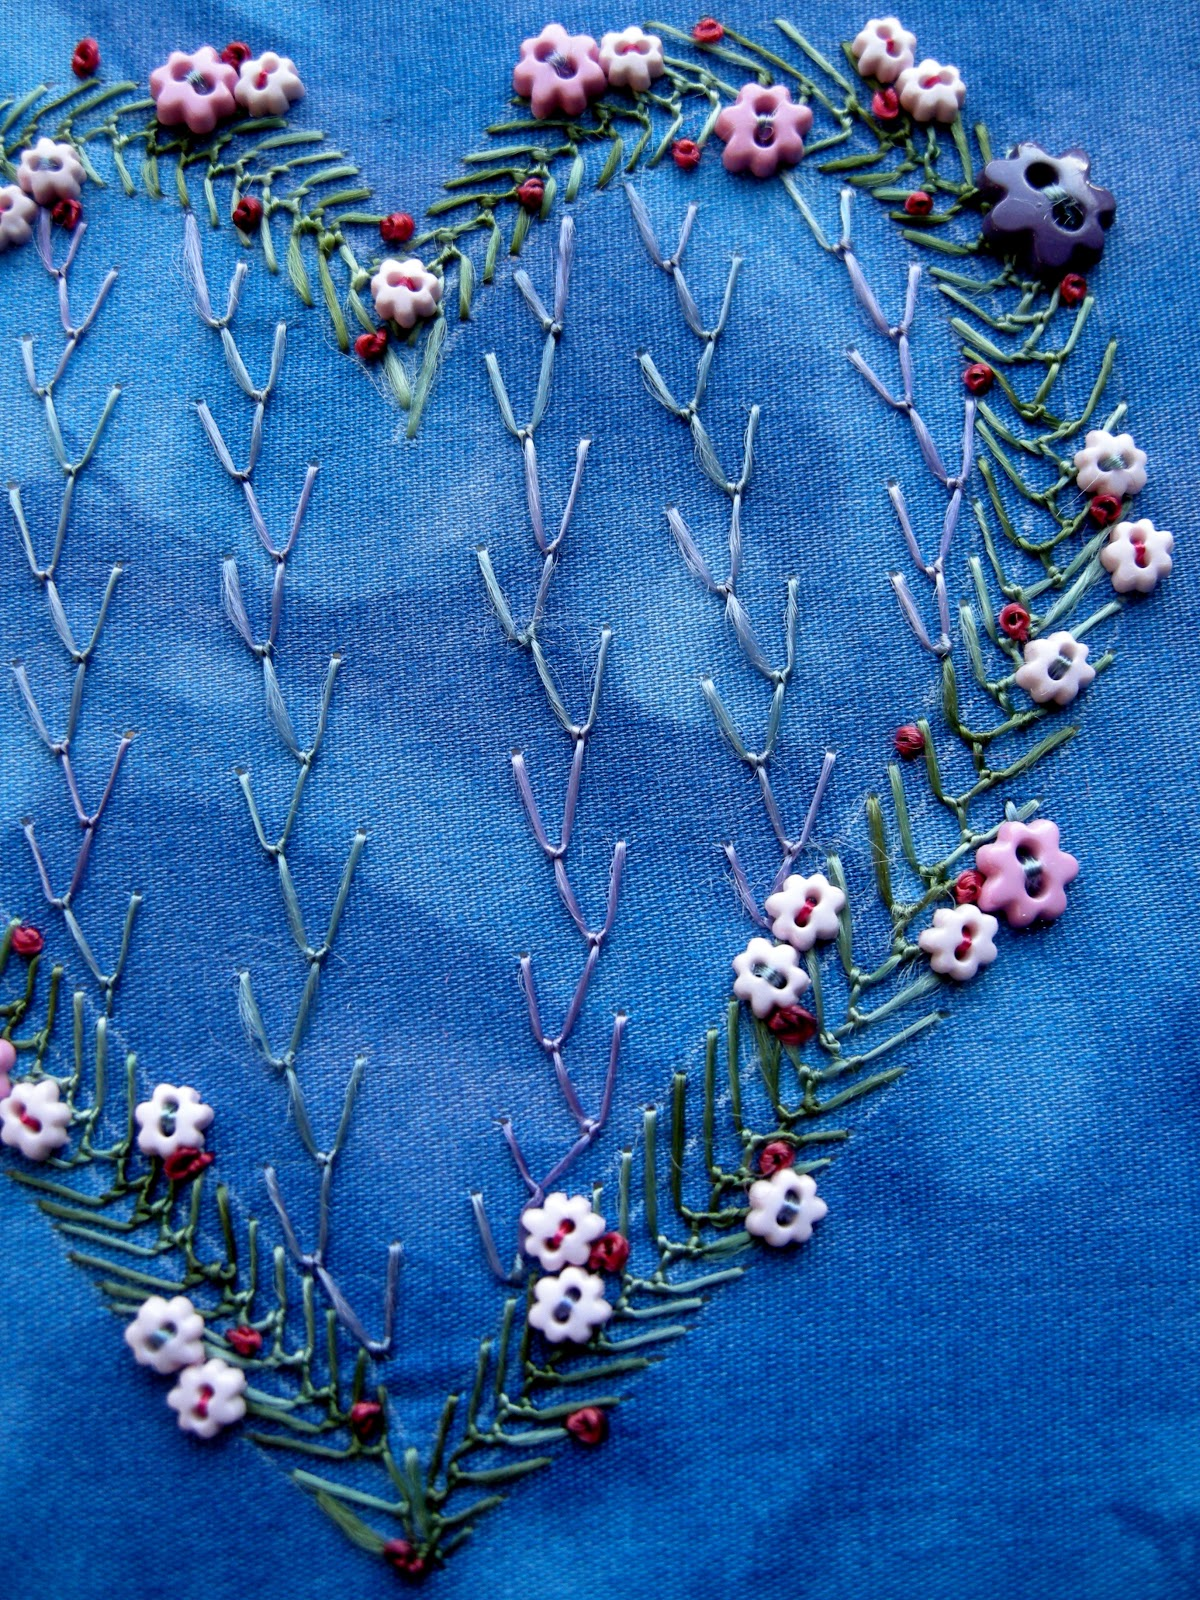 Queenies Needlework January 2013